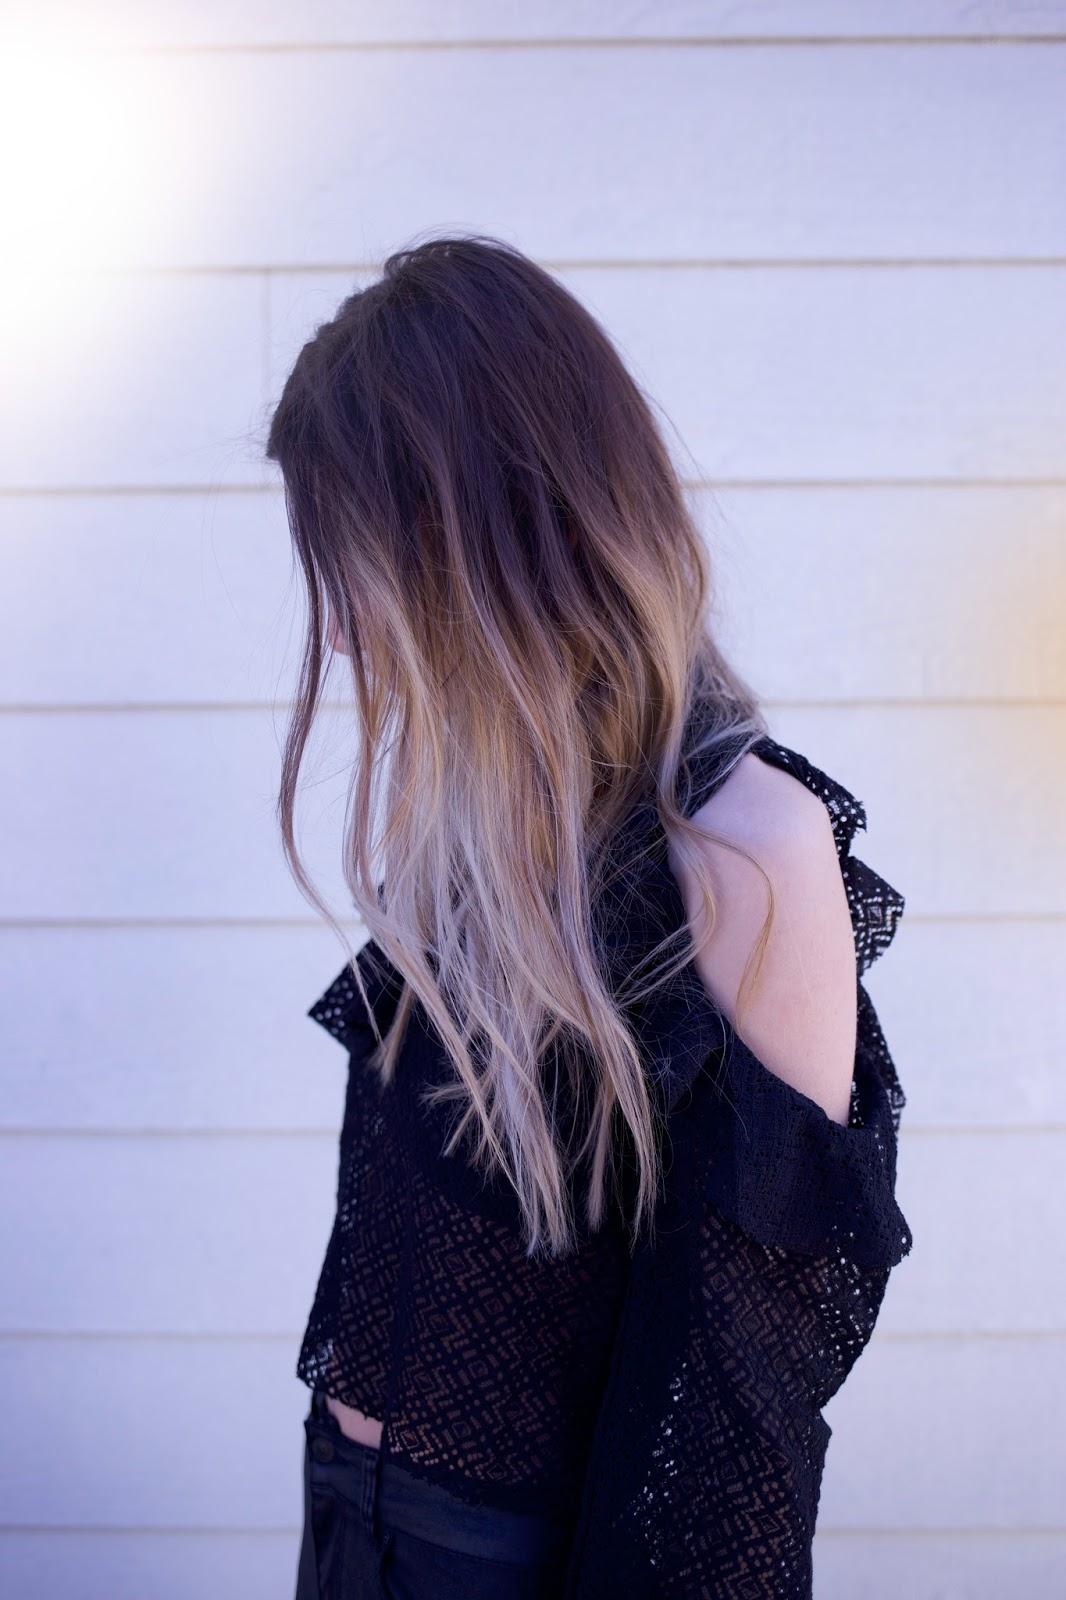 Maeva Dck, ombre hair, balayage, hairstyle